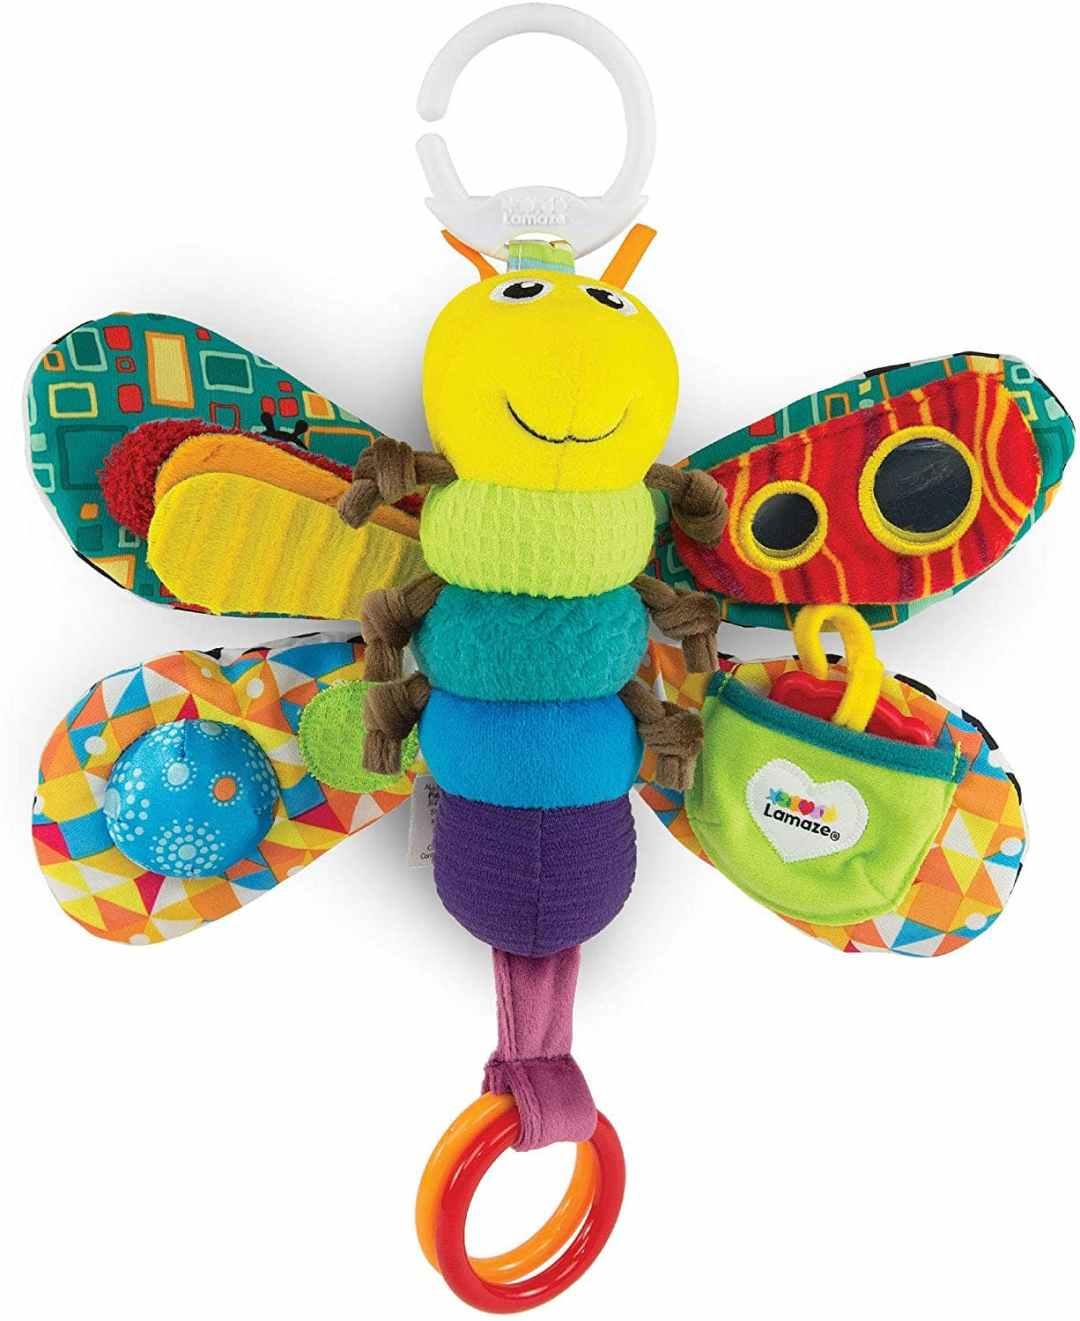 Lamaze Freddie the Firefly Rattle Baby Toy